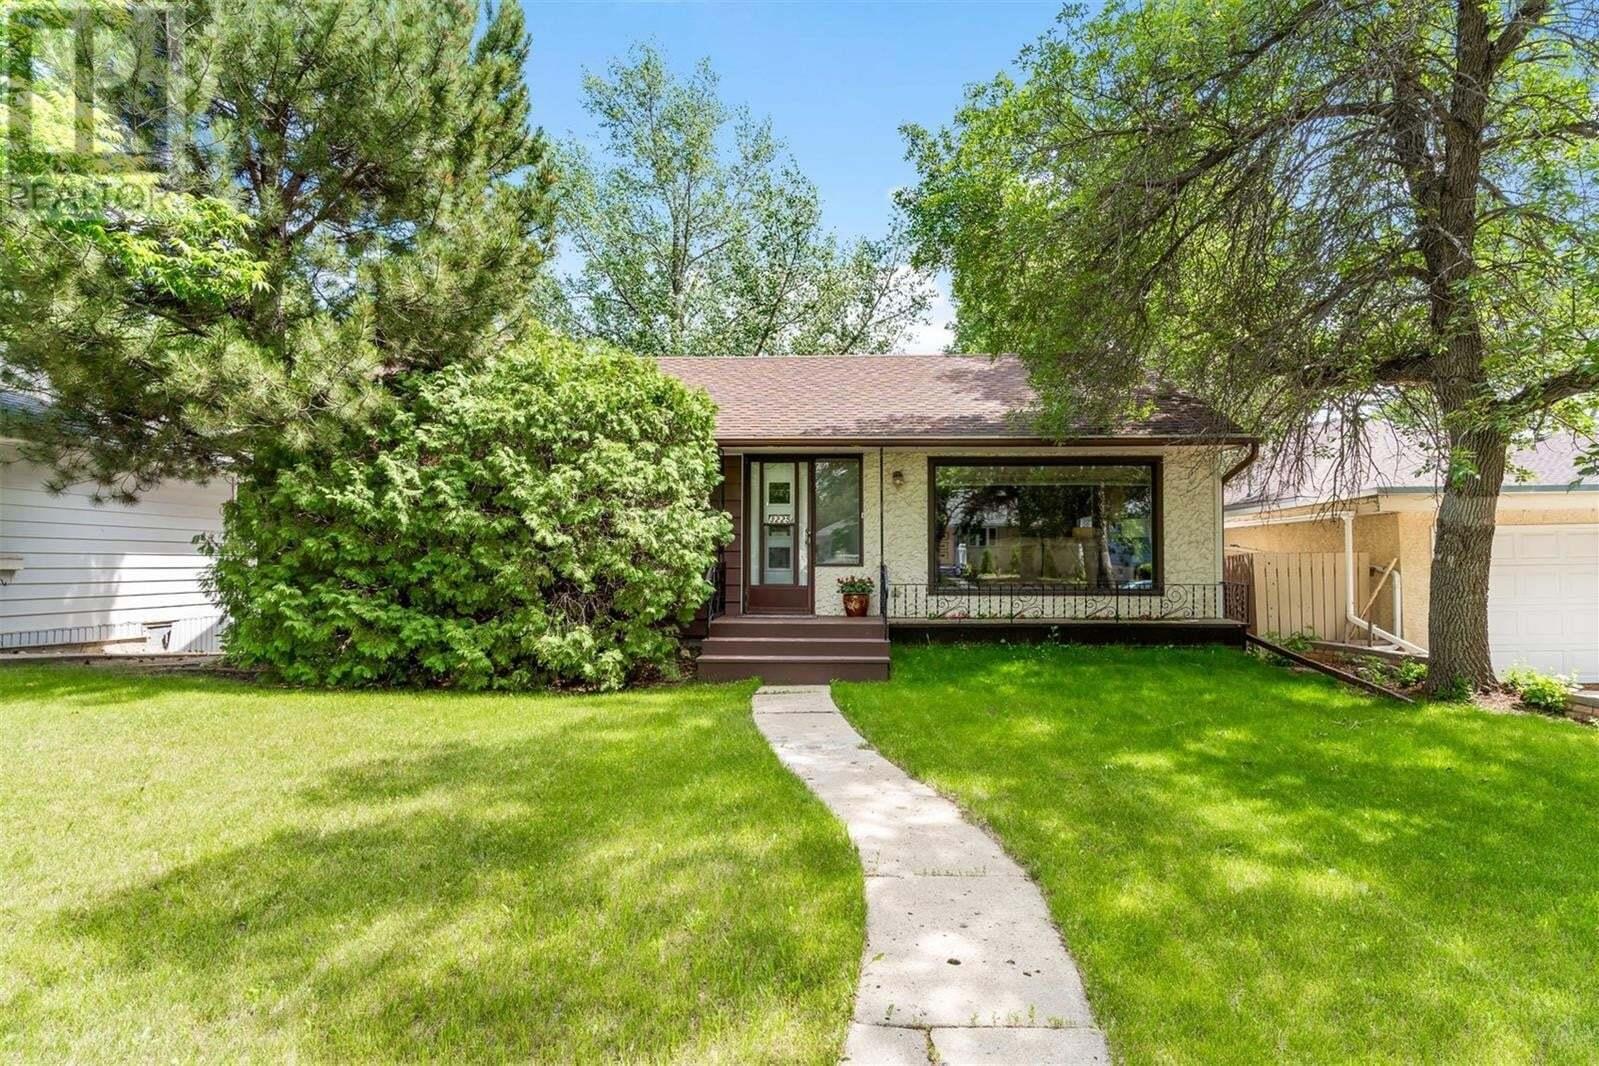 House for sale at 3225 Whitmore Ave Regina Saskatchewan - MLS: SK815643